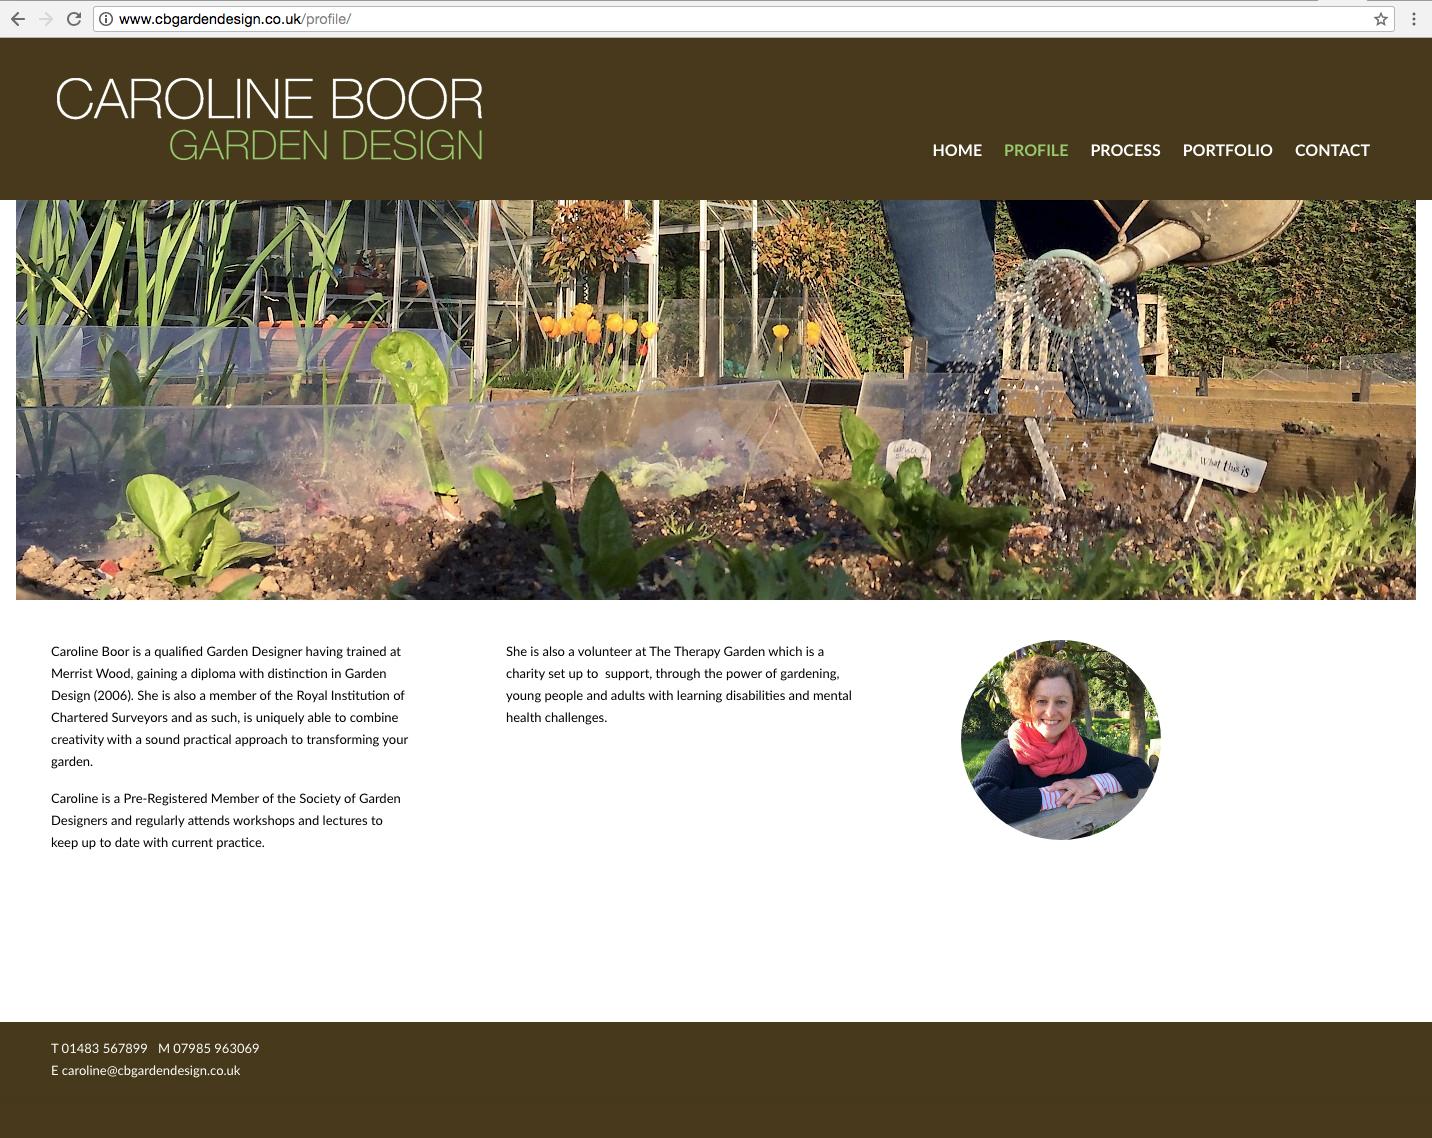 Caroline Boor website about